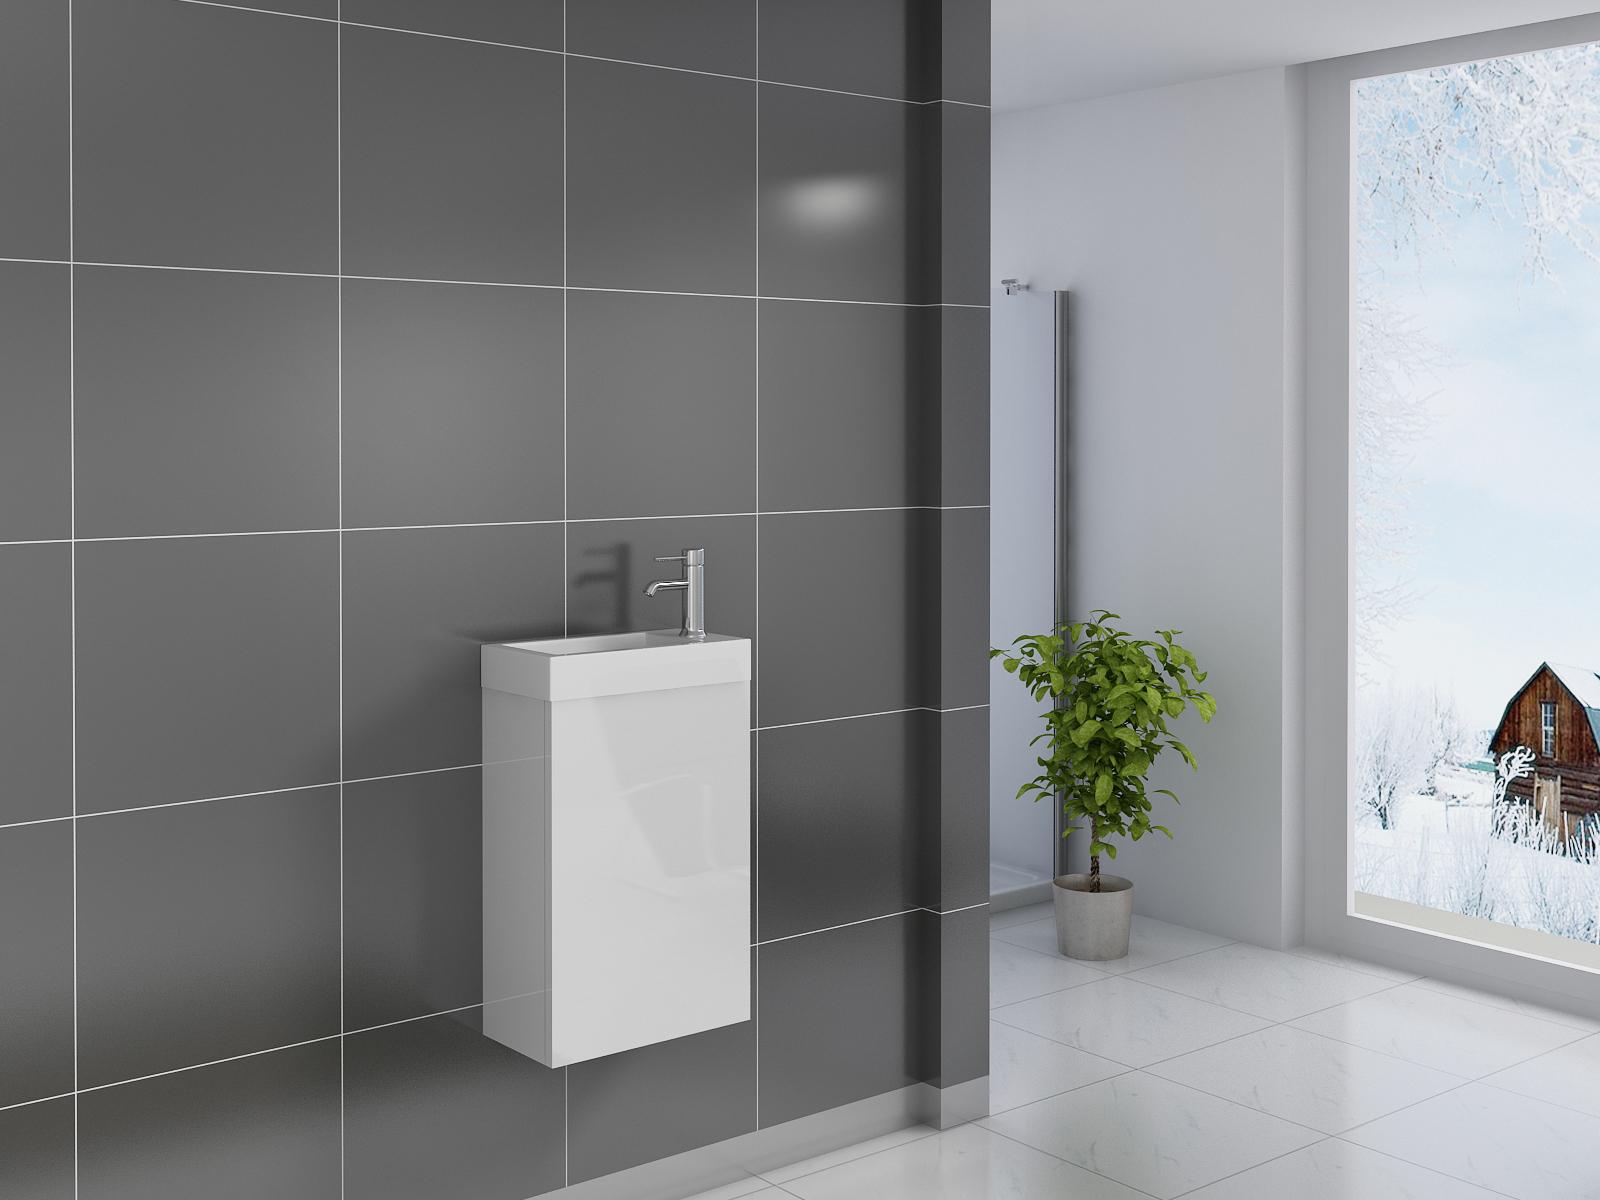 sam badezimmer waschplatz wei hochglanz vega demn chst. Black Bedroom Furniture Sets. Home Design Ideas